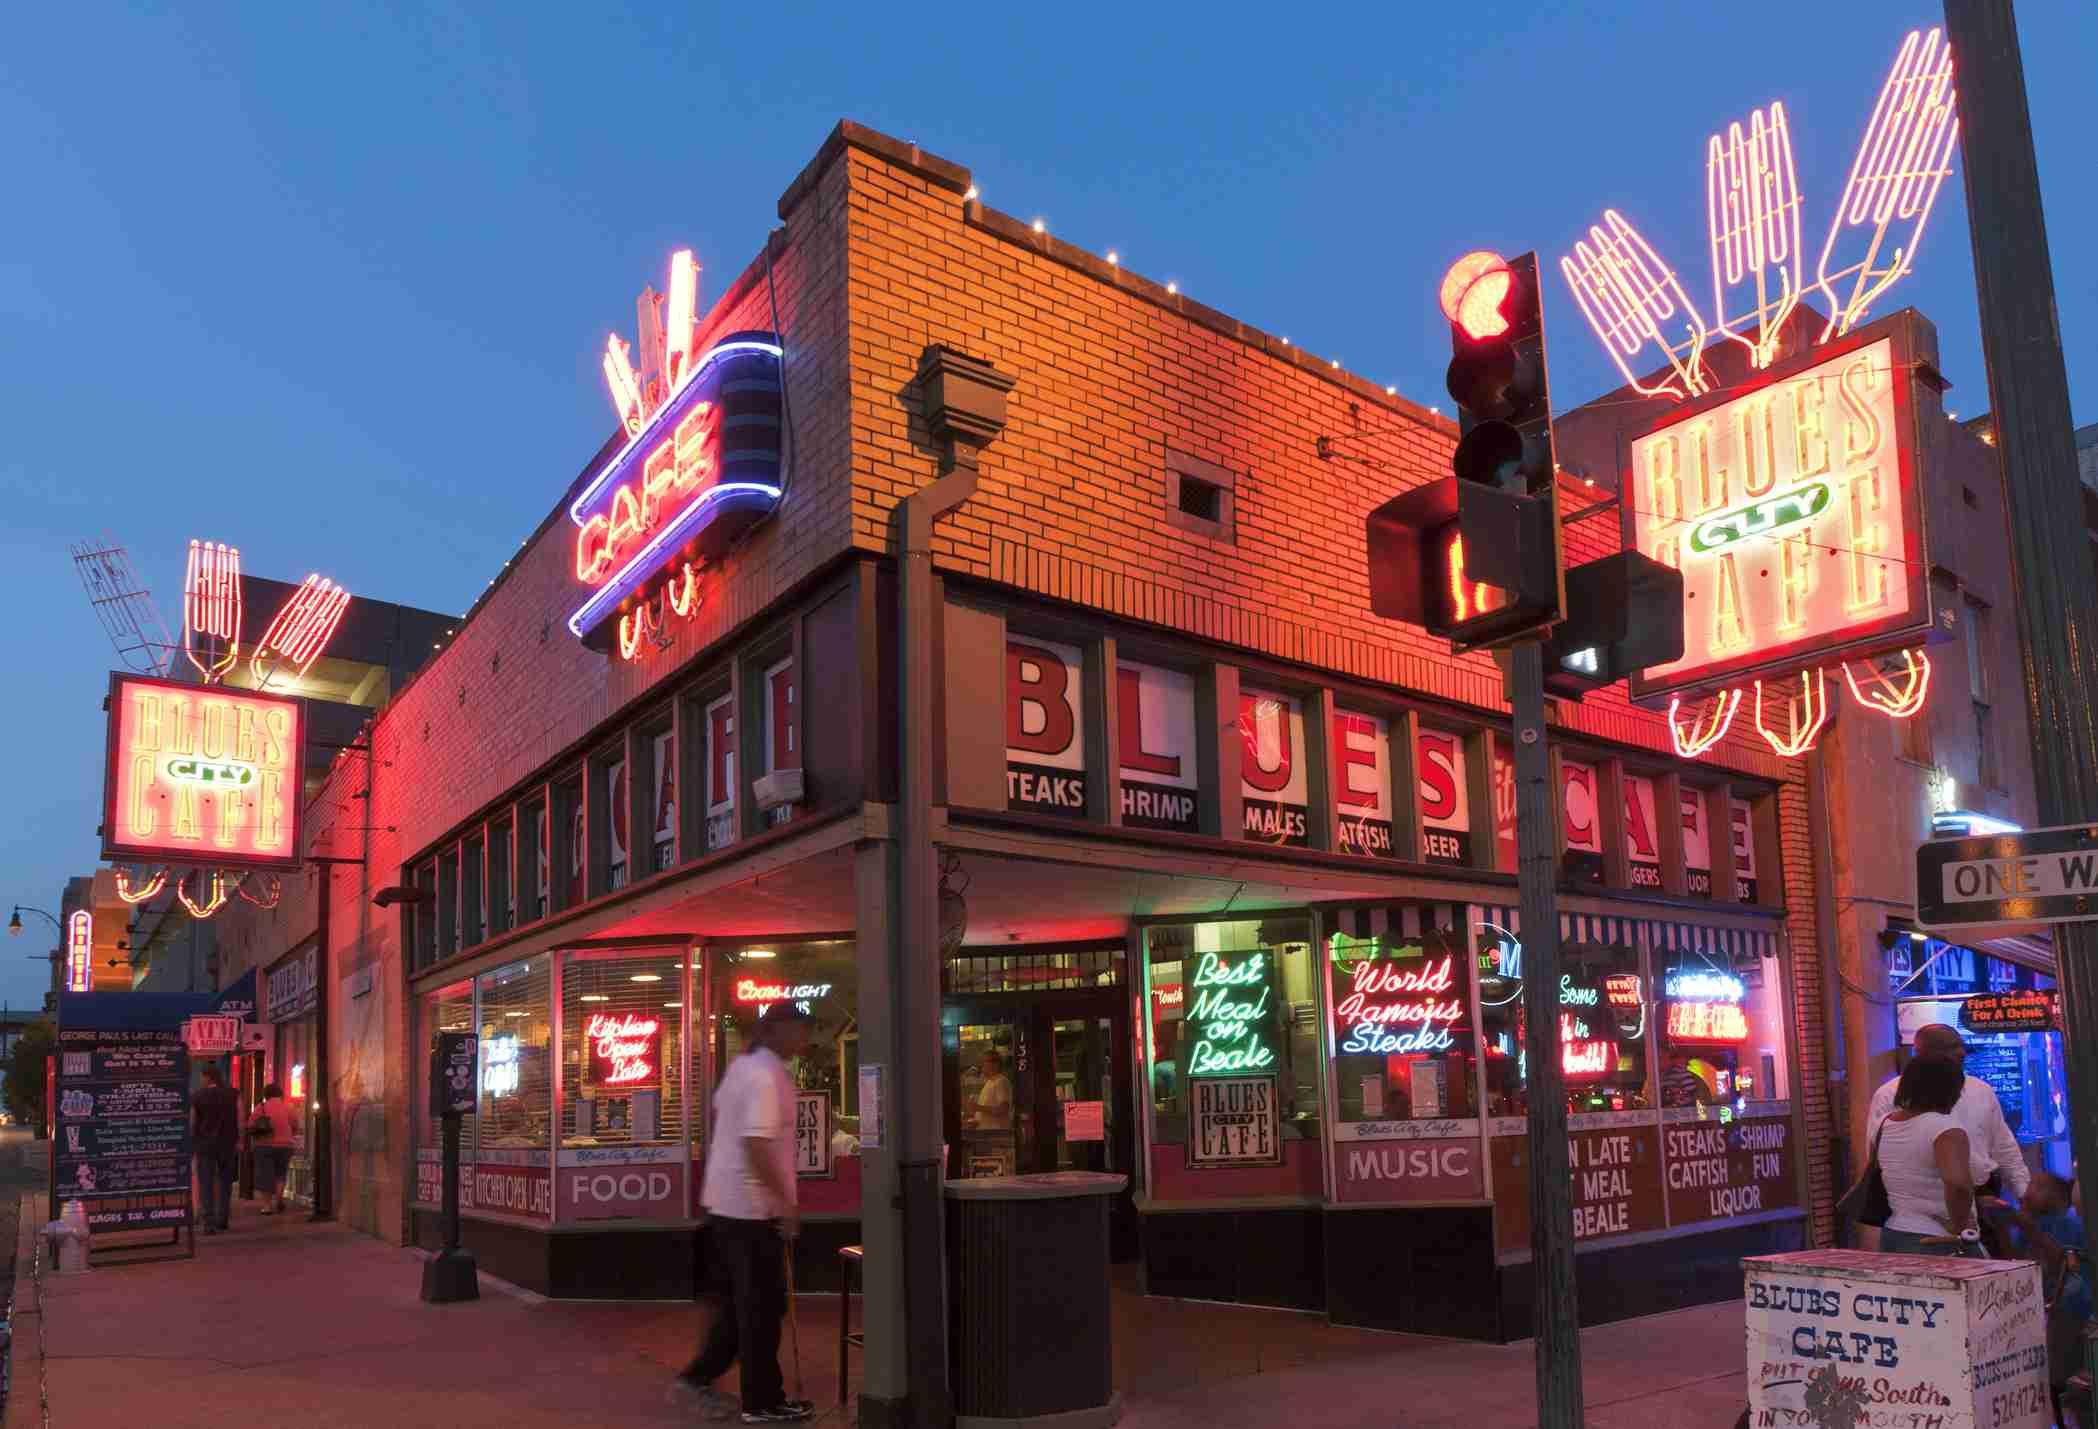 Blues City Cafe on Beale.